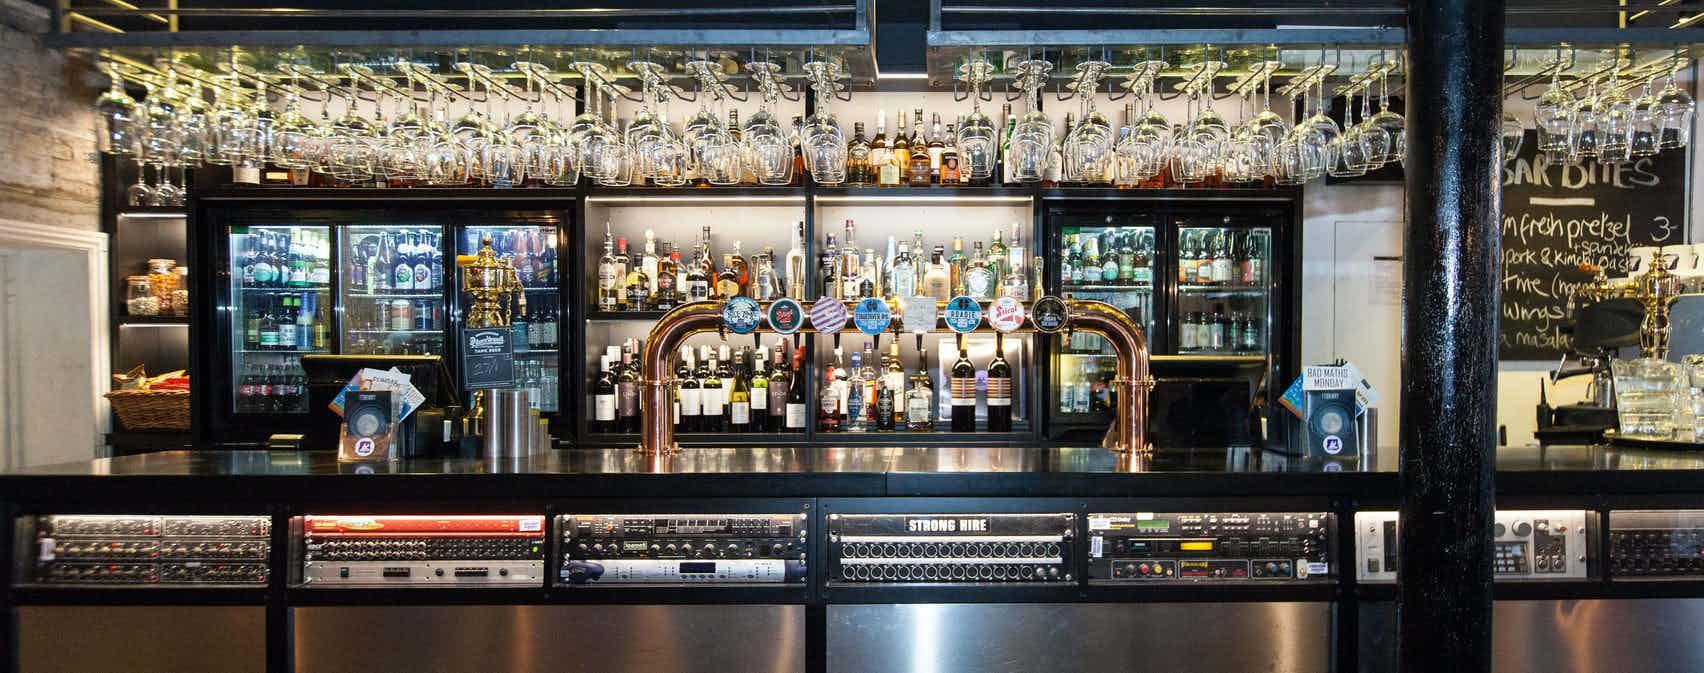 Rivington Street Bar, Strongroom Bar